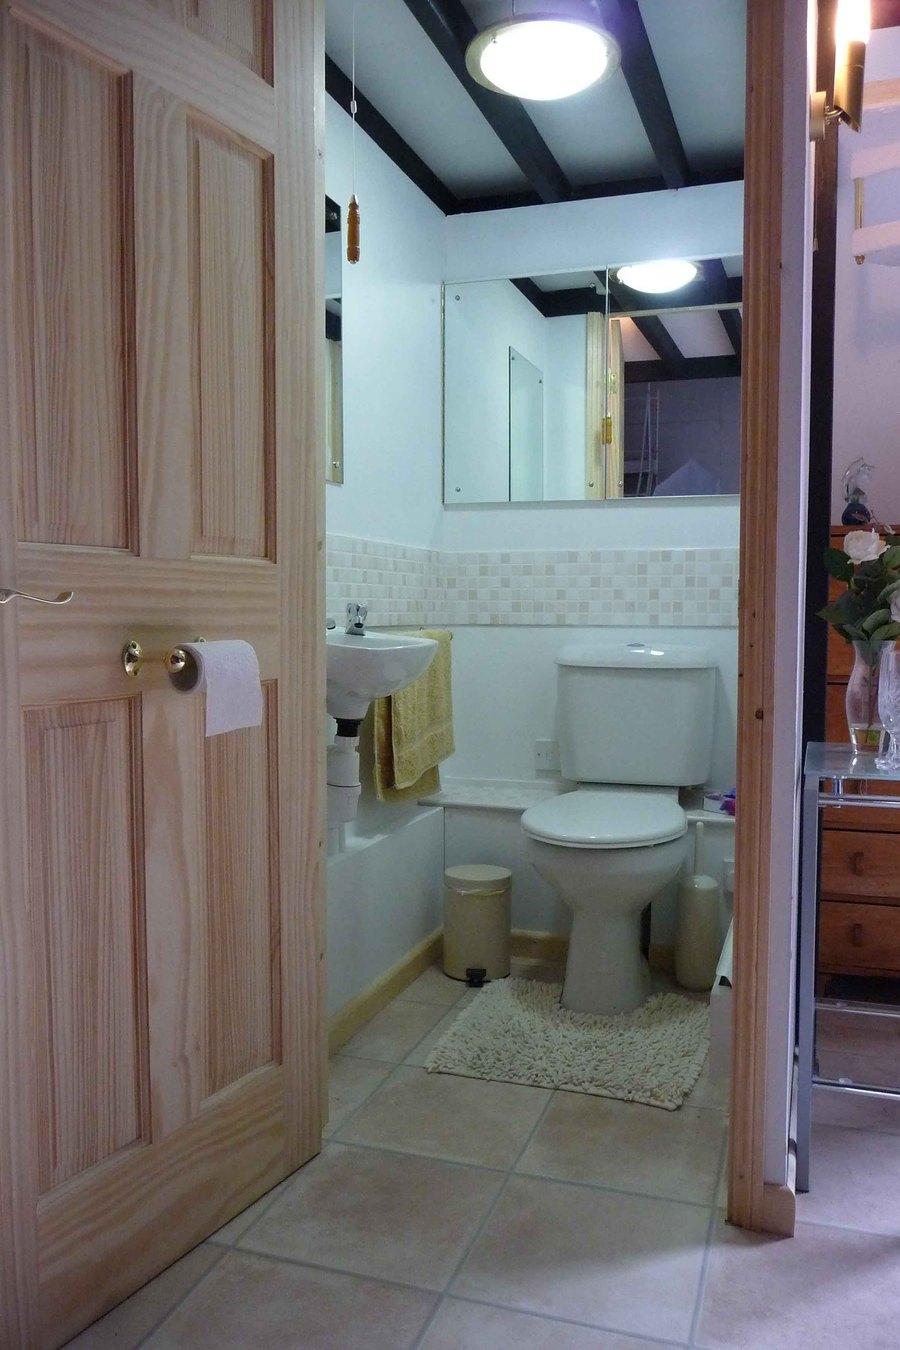 Toilet / Taken at Photo39 / Uploaded 1st February 2012 @ 11:49 AM